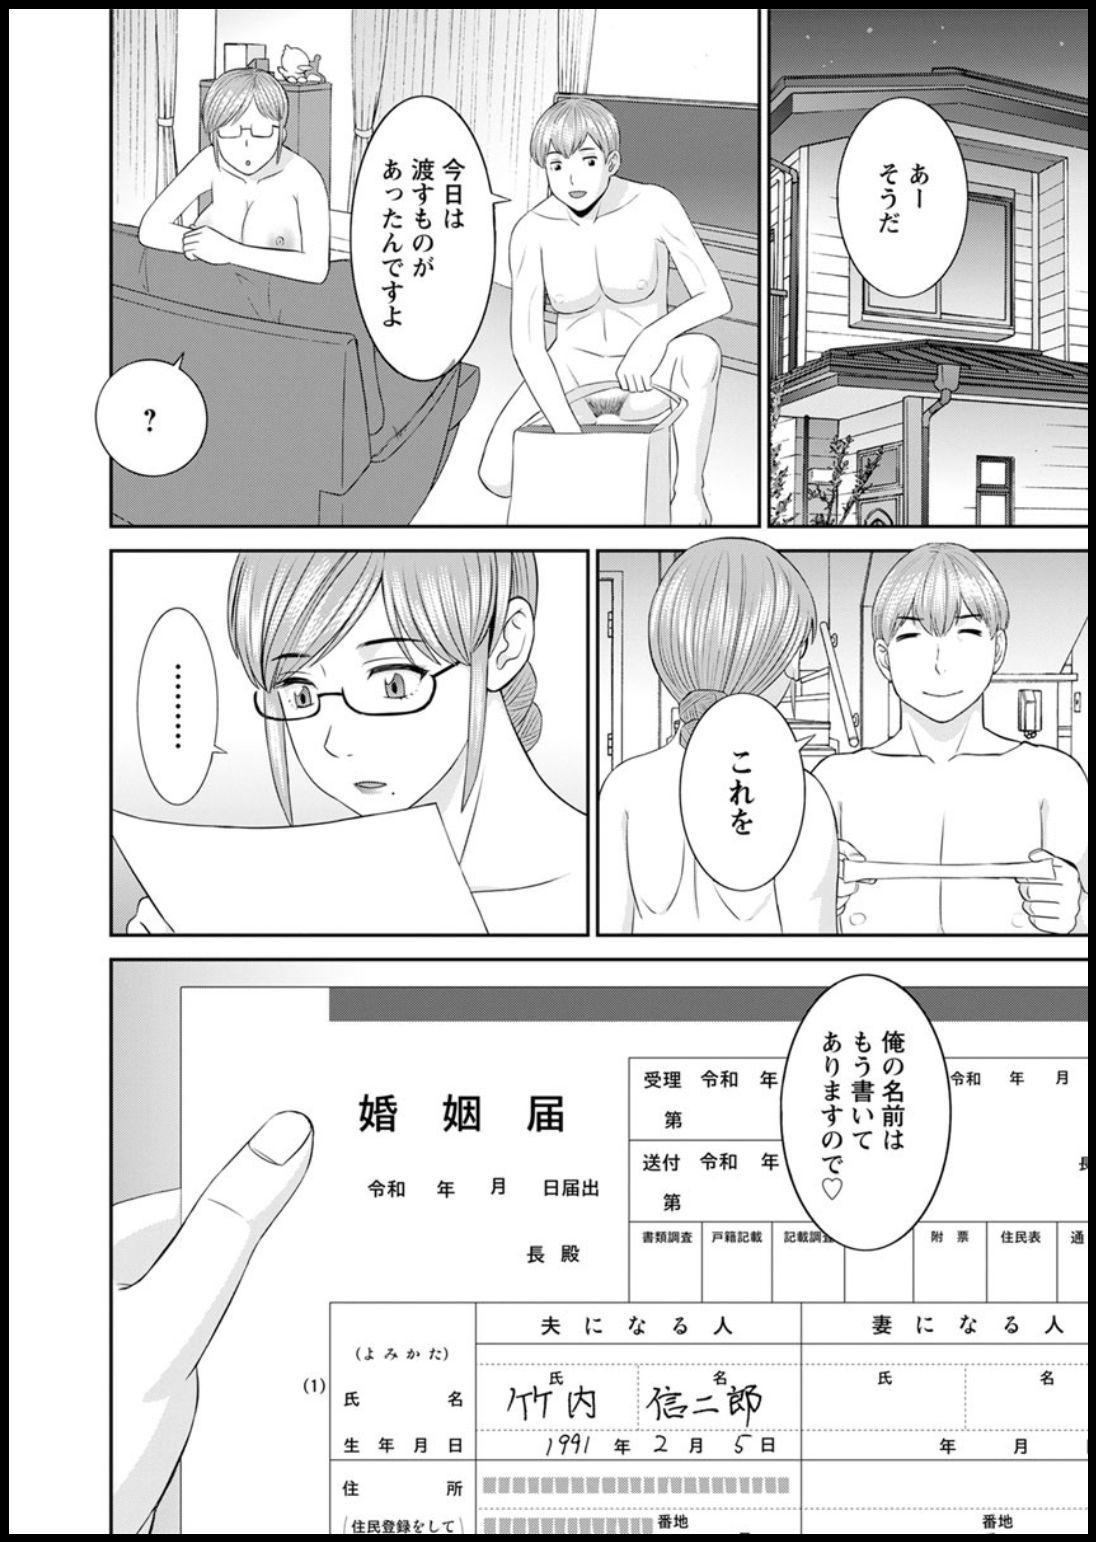 [Kawamori Misaki] Kaikan Hitotsuma Gakuen Ch. 1-6, 8-20 [Digital] 163